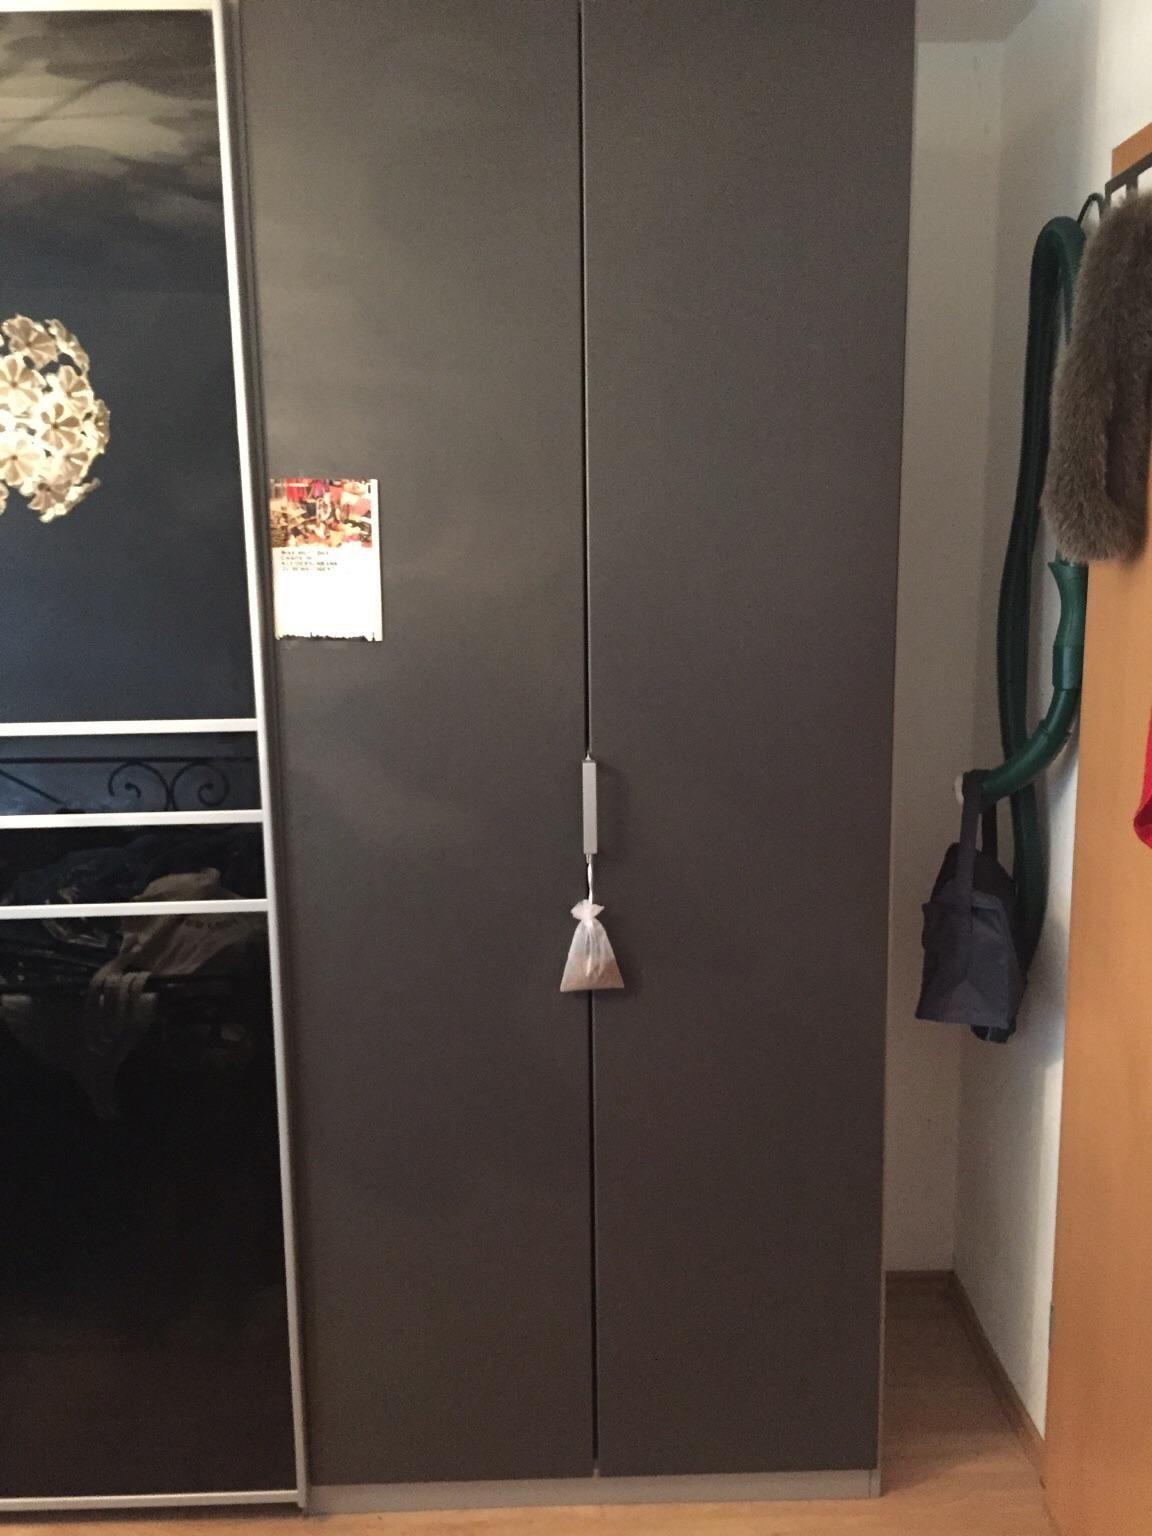 Fancy Gebraucht Kleiderschrank grau wie neu in Leonberg um uac u Shpock